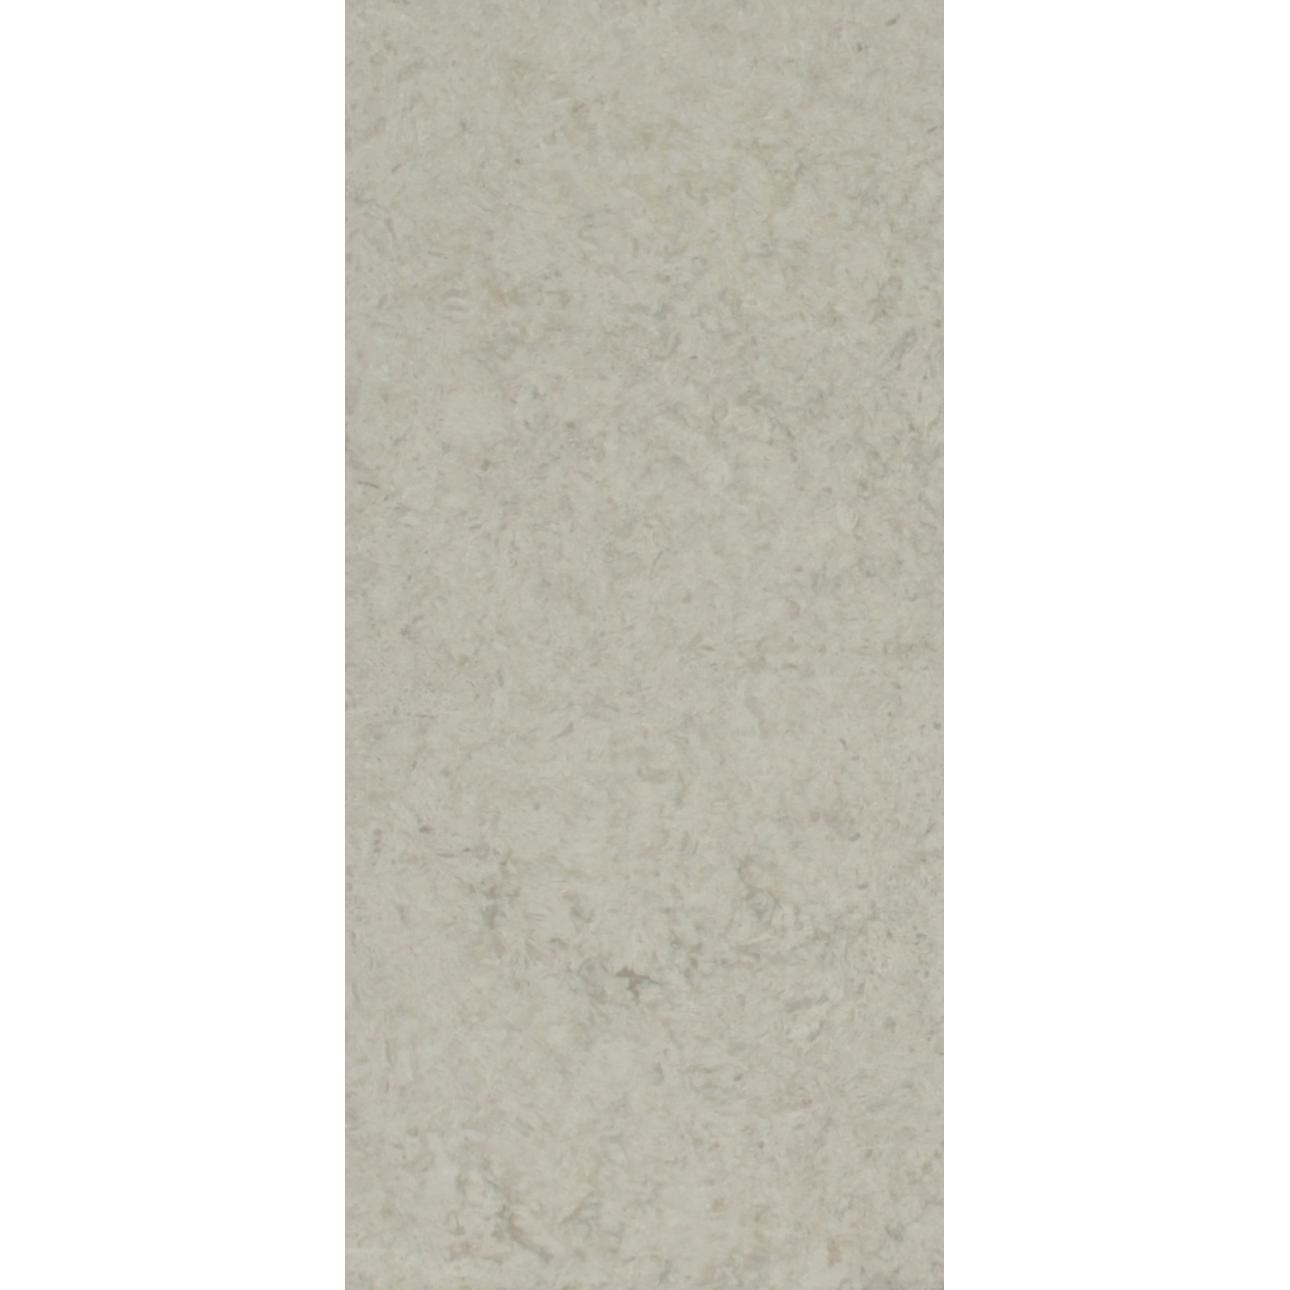 Image for Q 22716-1: Portico Cream